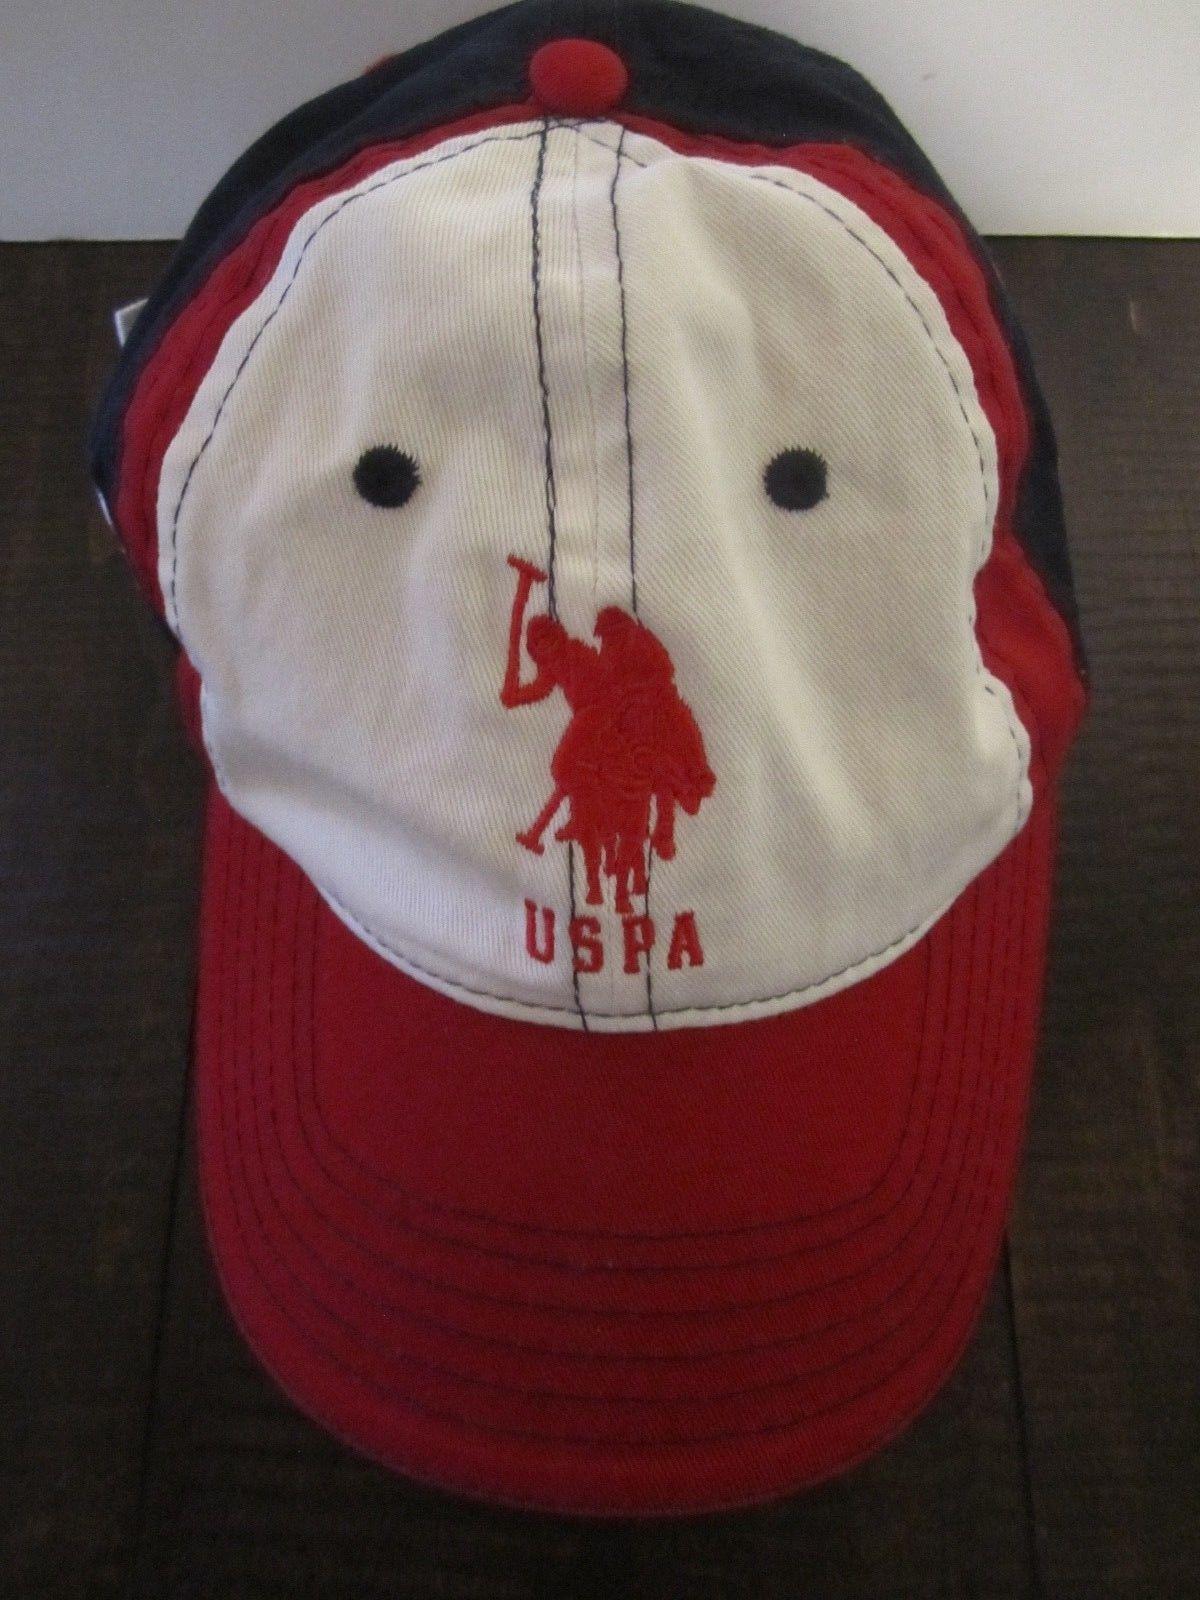 c2b145e0 Polo Ralph Lauren USA hat cap large pony and 48 similar items. S l1600